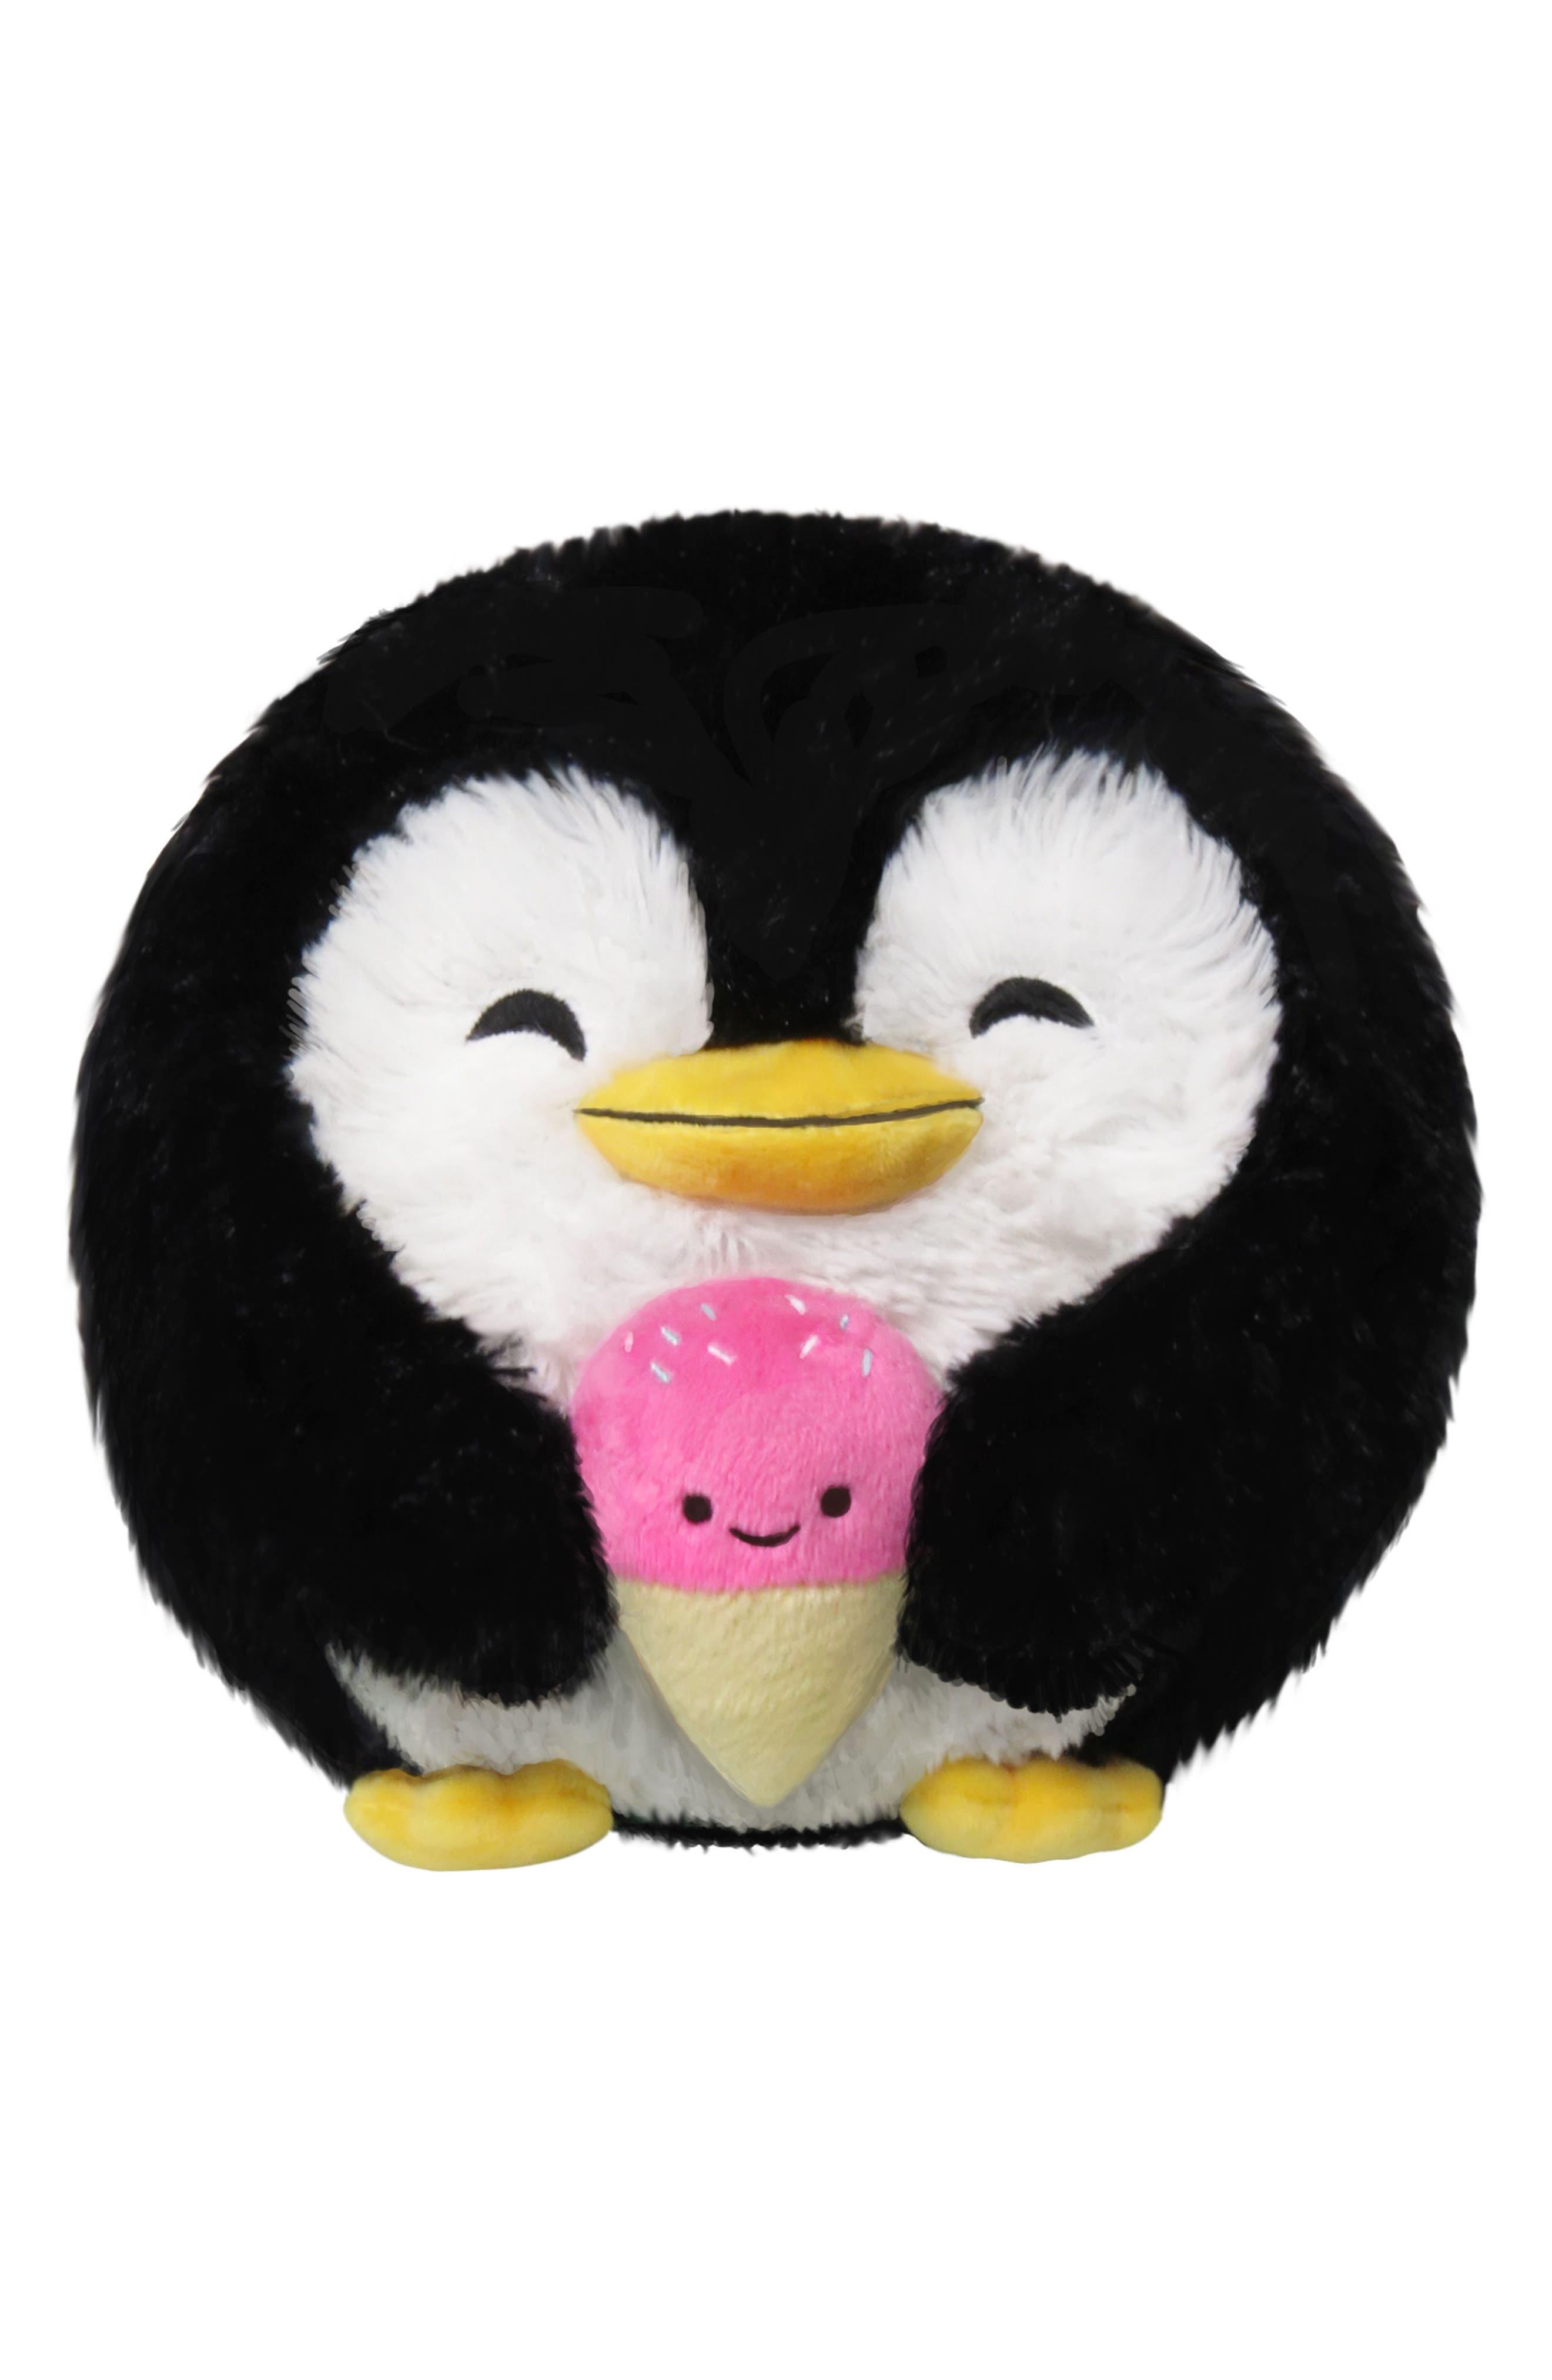 Squishable Mini Penguin Stuffed Animal